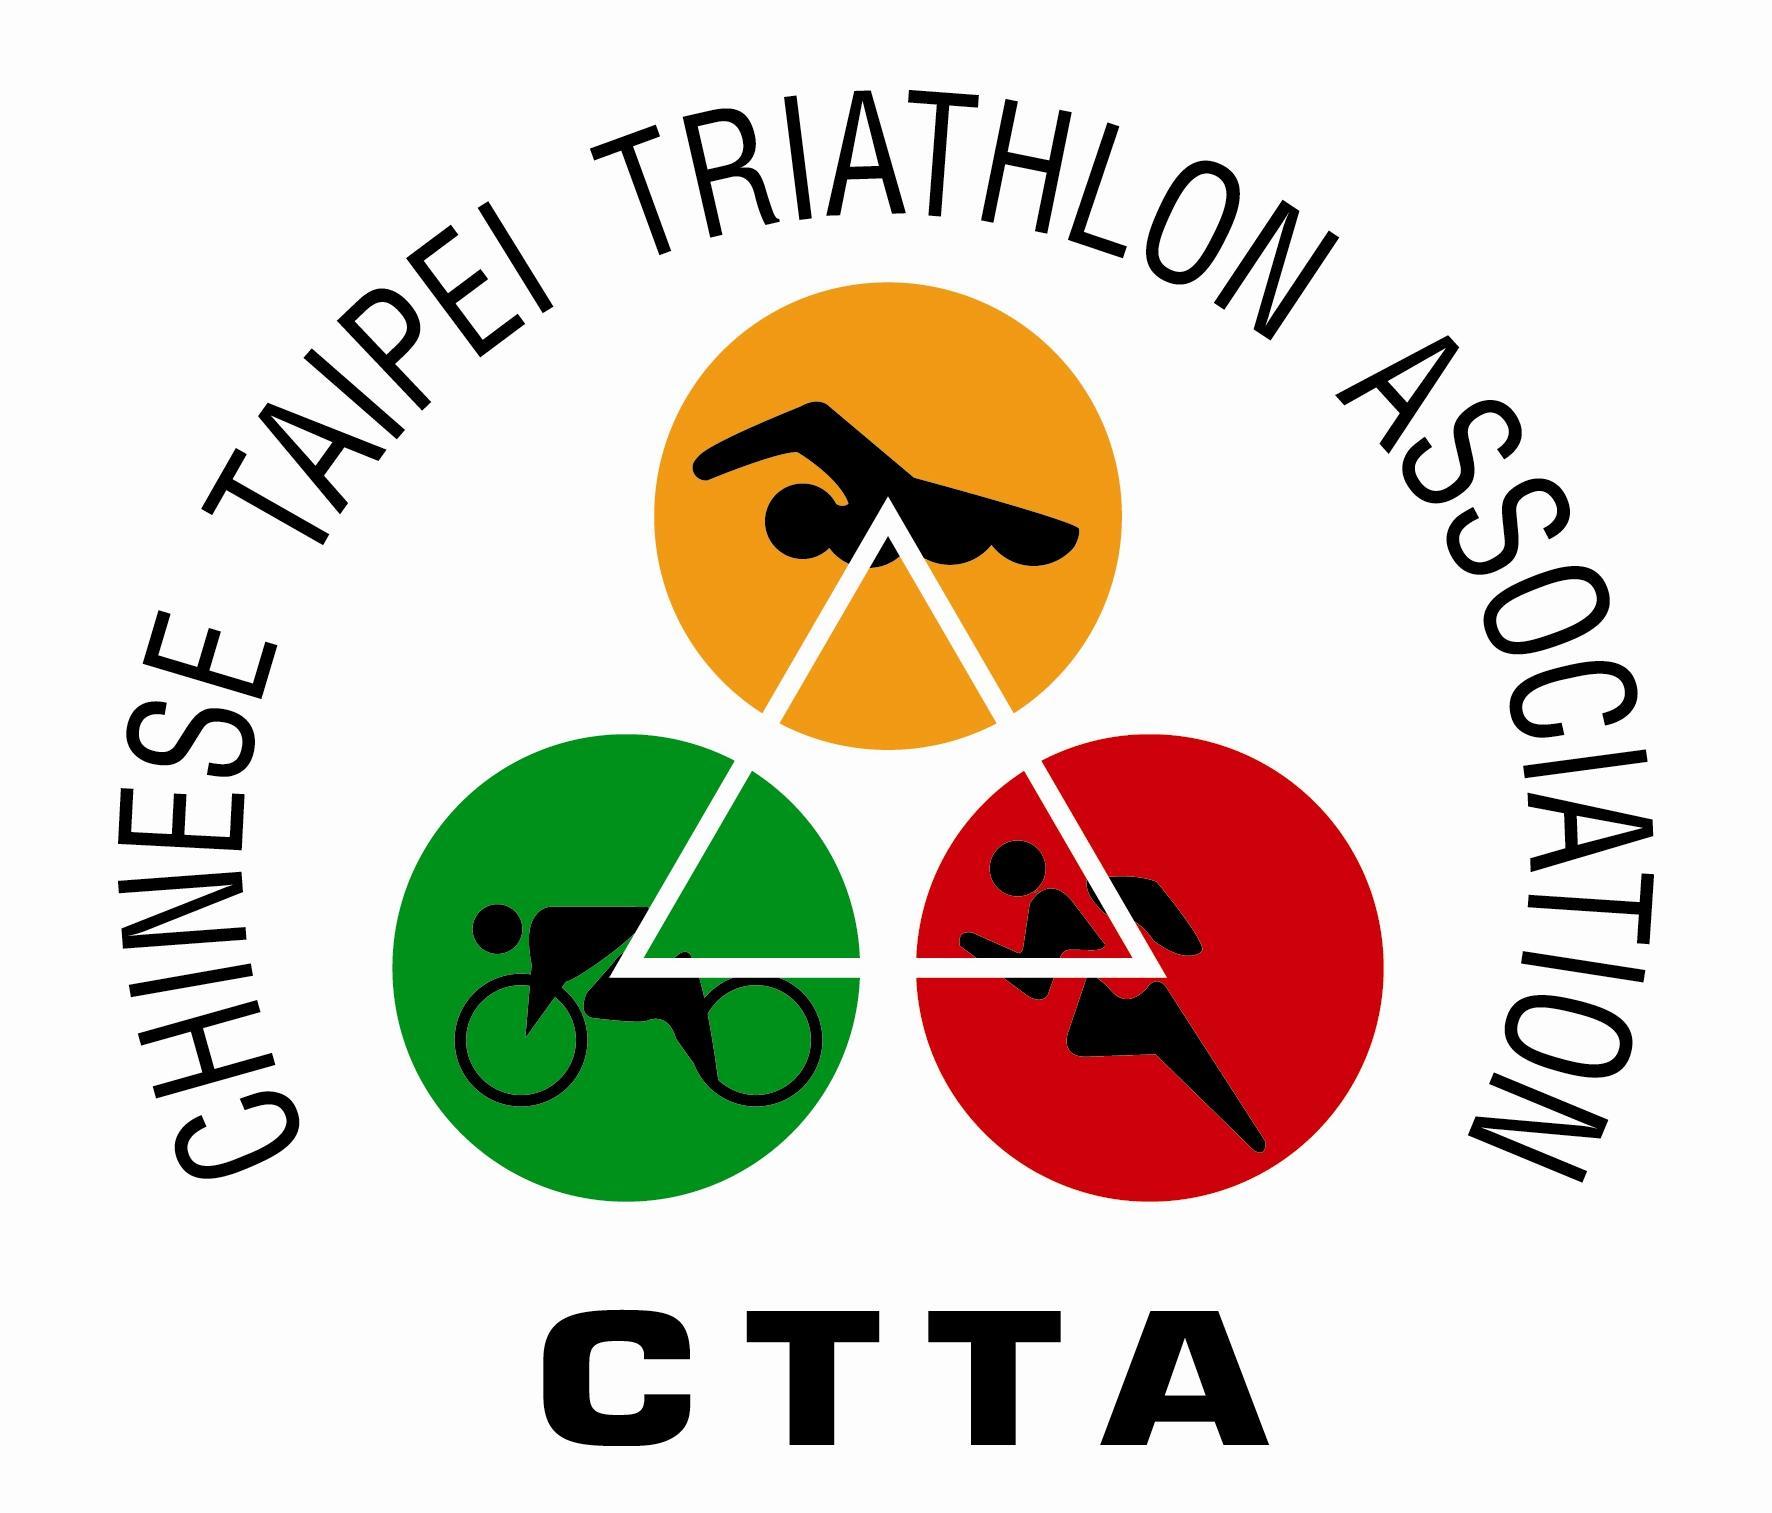 Chinese Taipei Triathlon Association (CTTA) logo